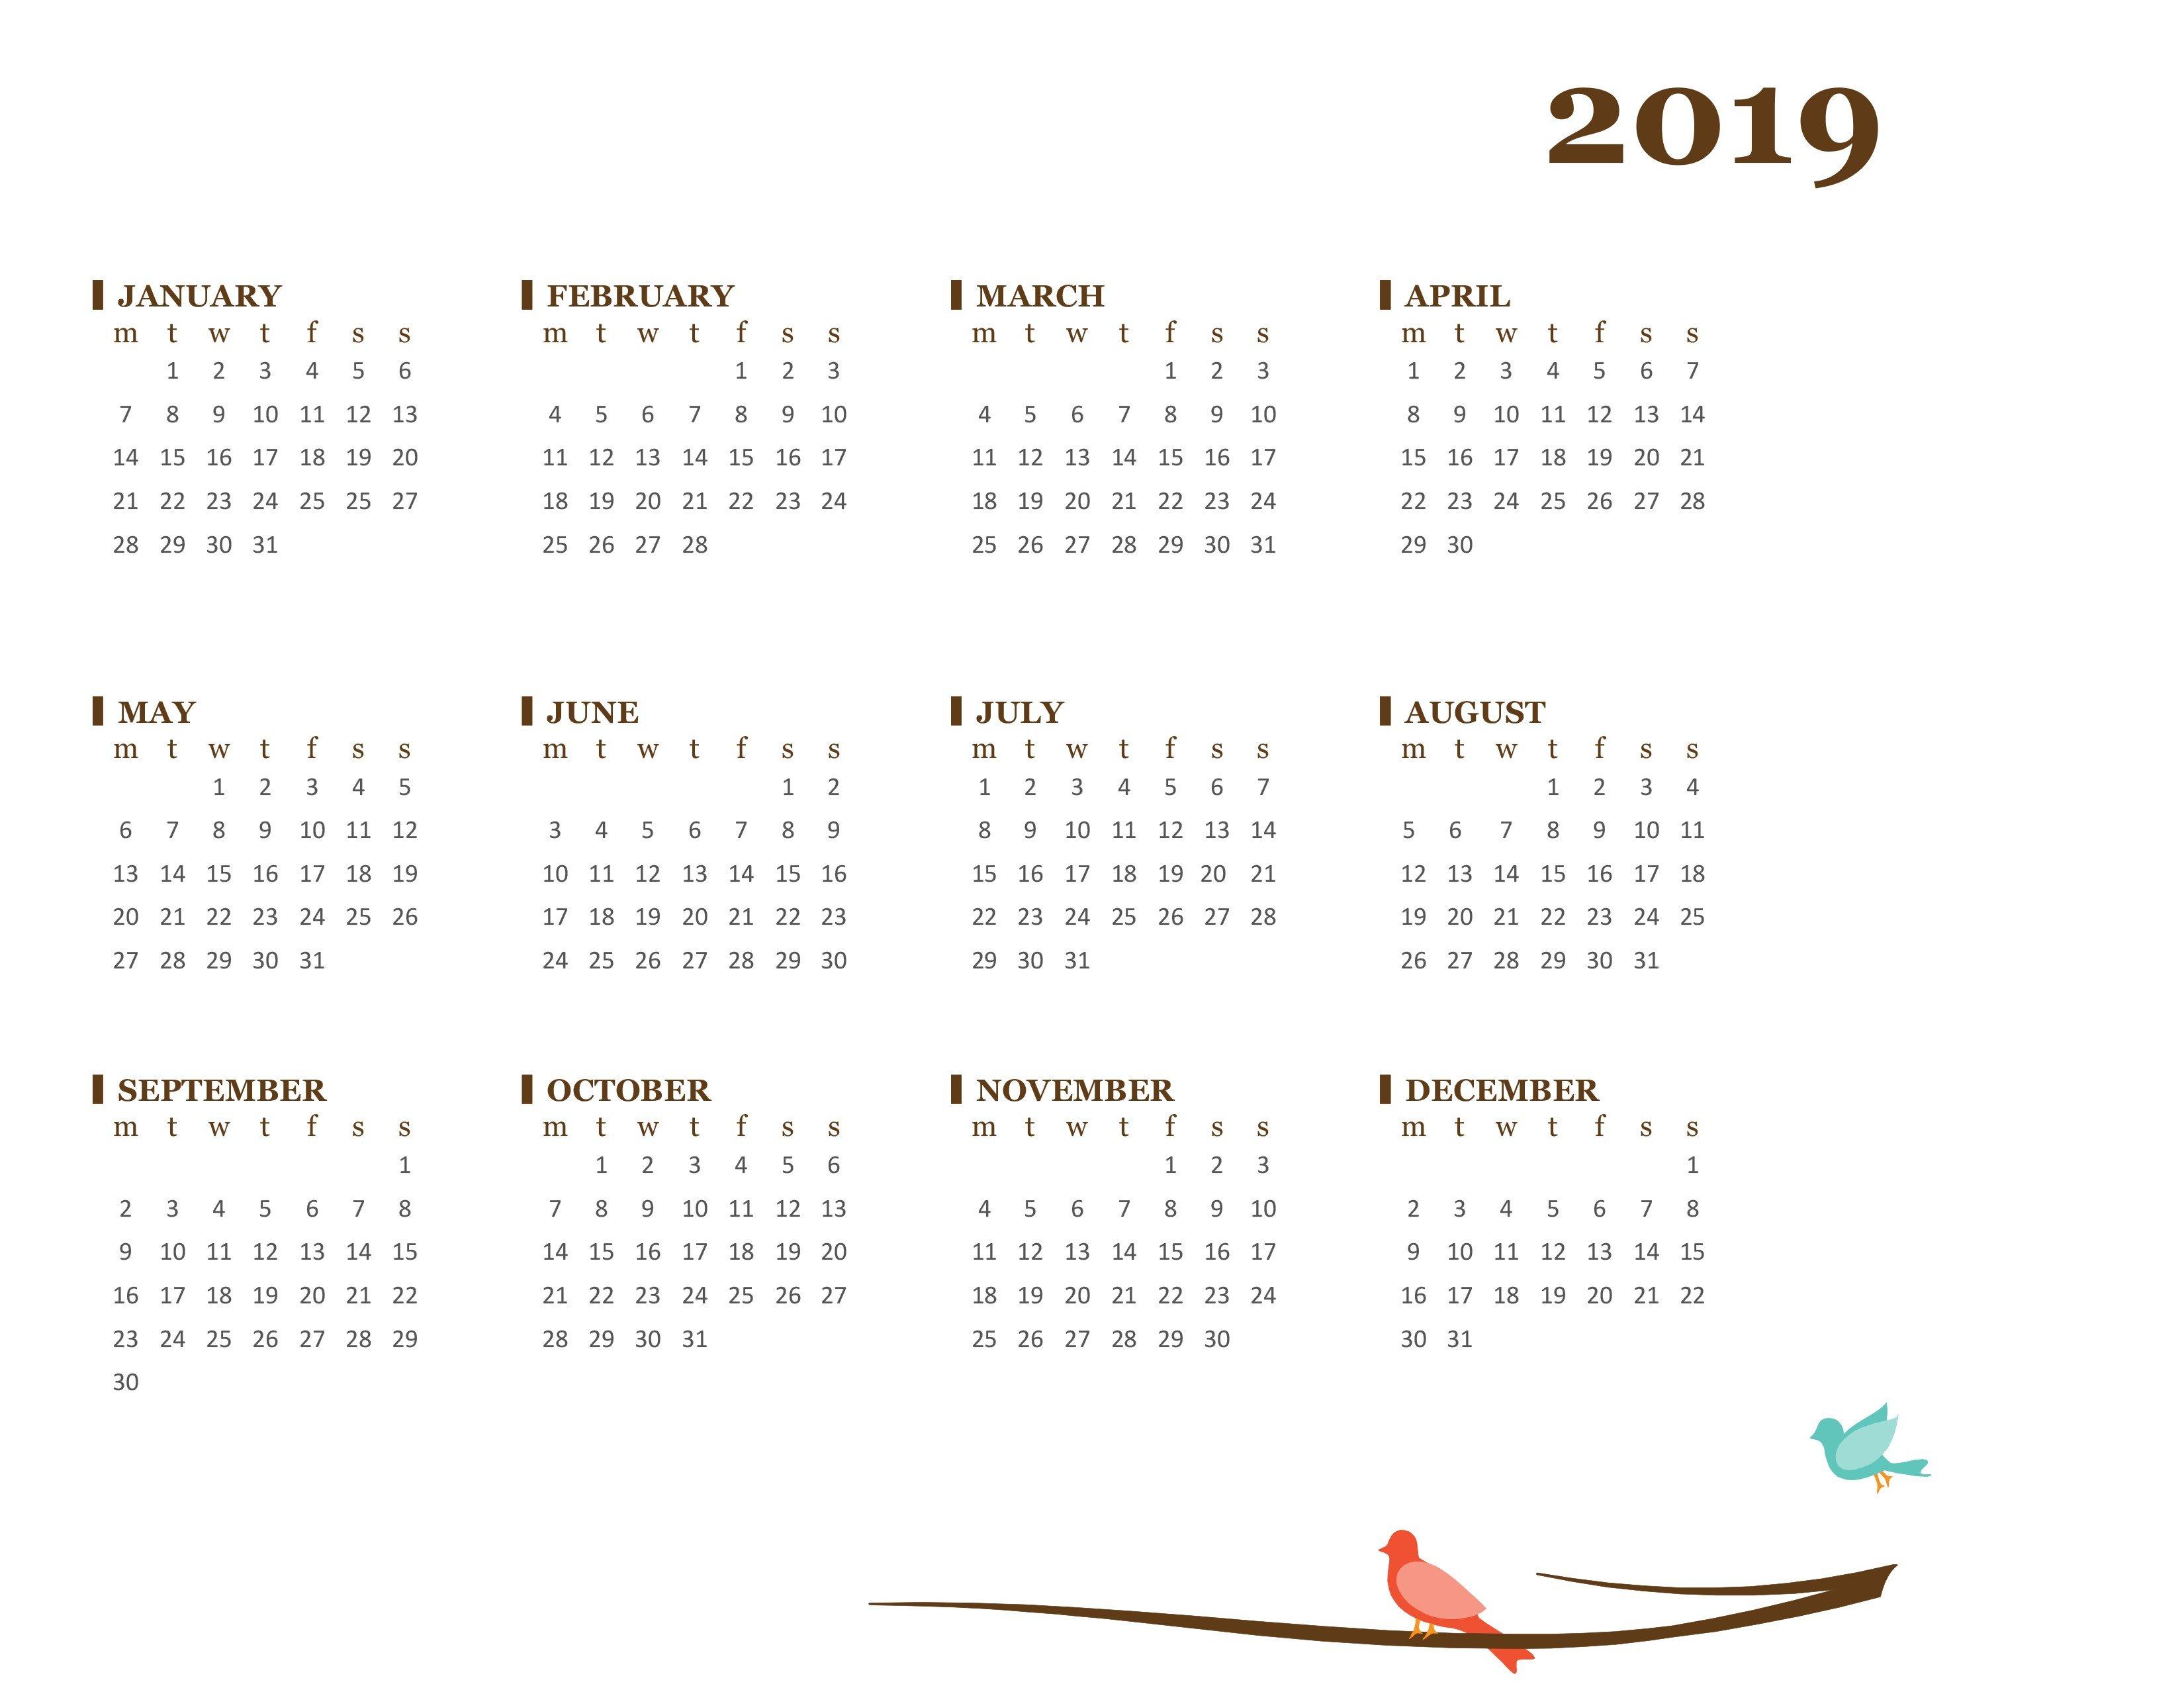 2019 Yearly Calendar (Mon Sun) Calendar 2019 Calendar